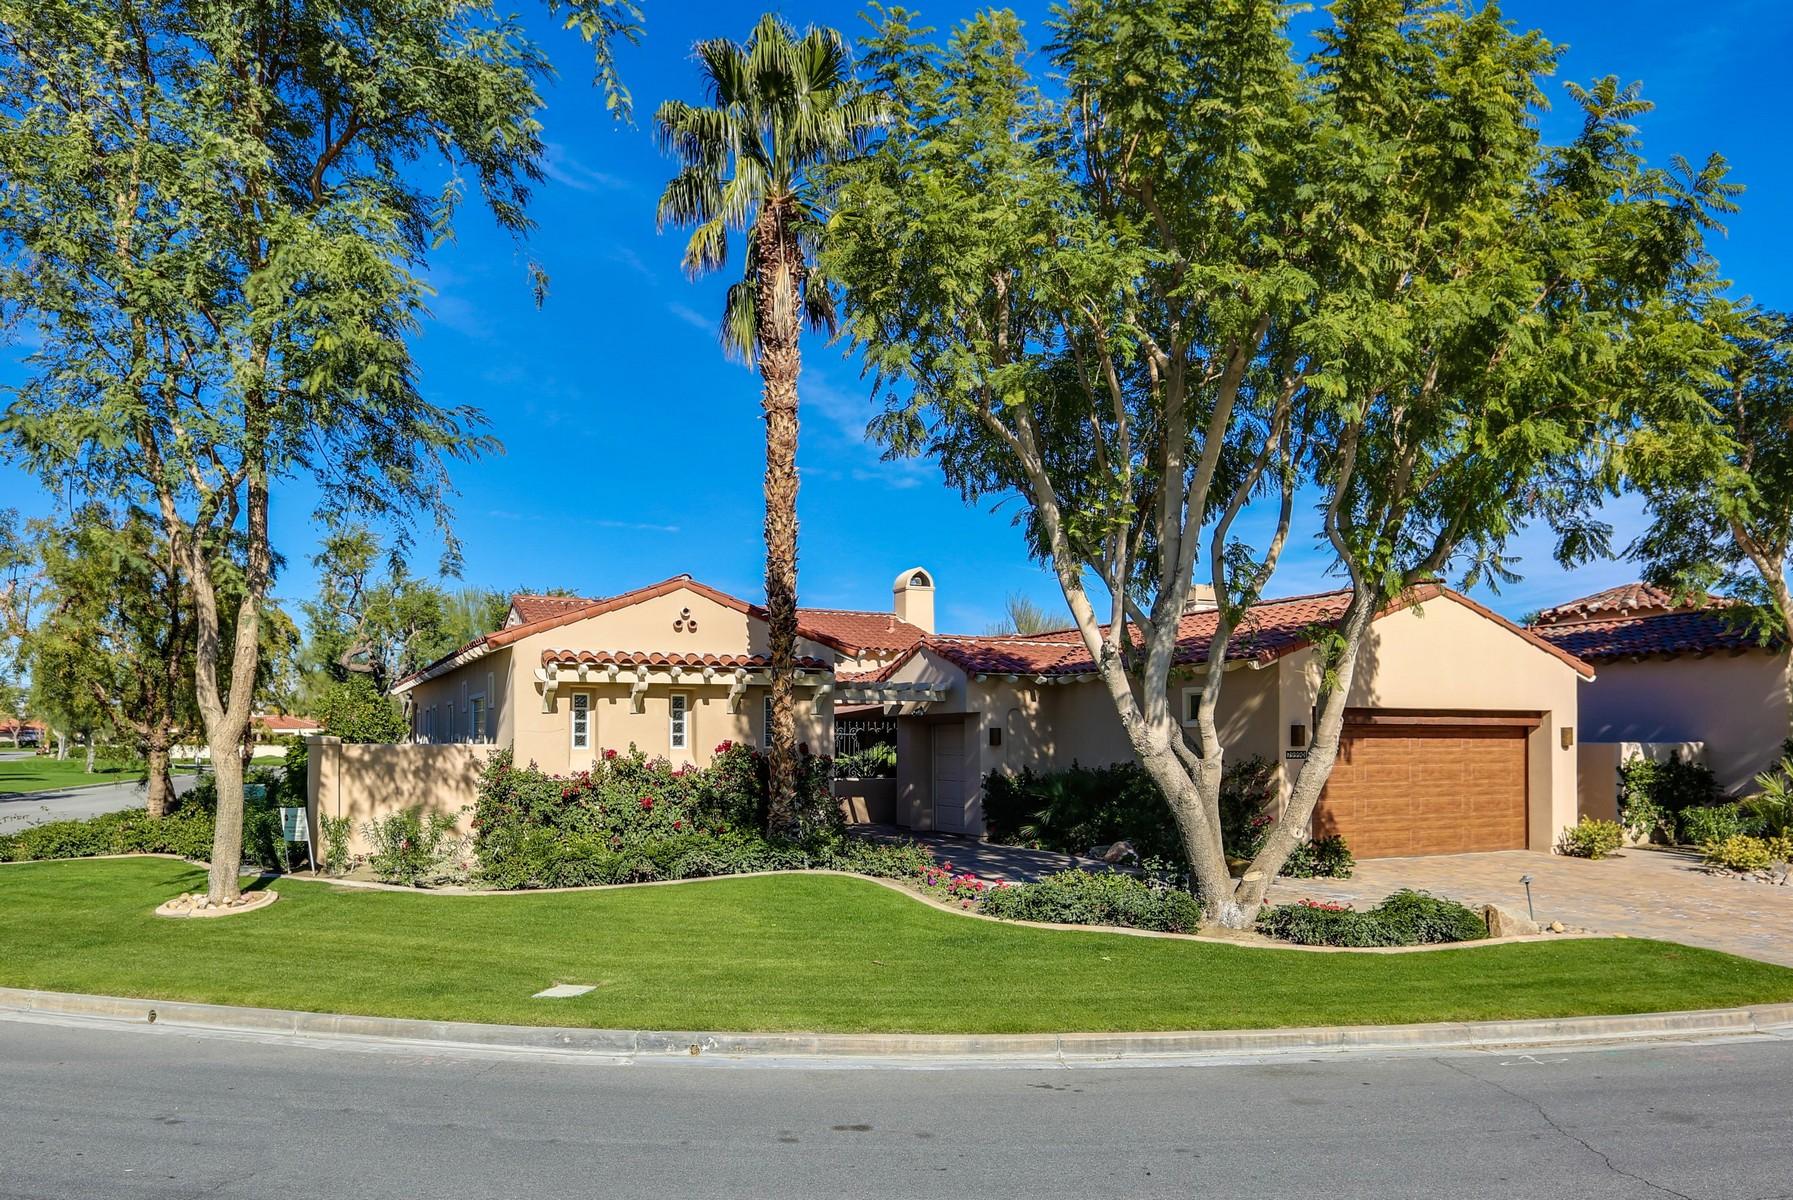 Single Family Home for Sale at 79990 Fresa La Quinta, California, 92253 United States